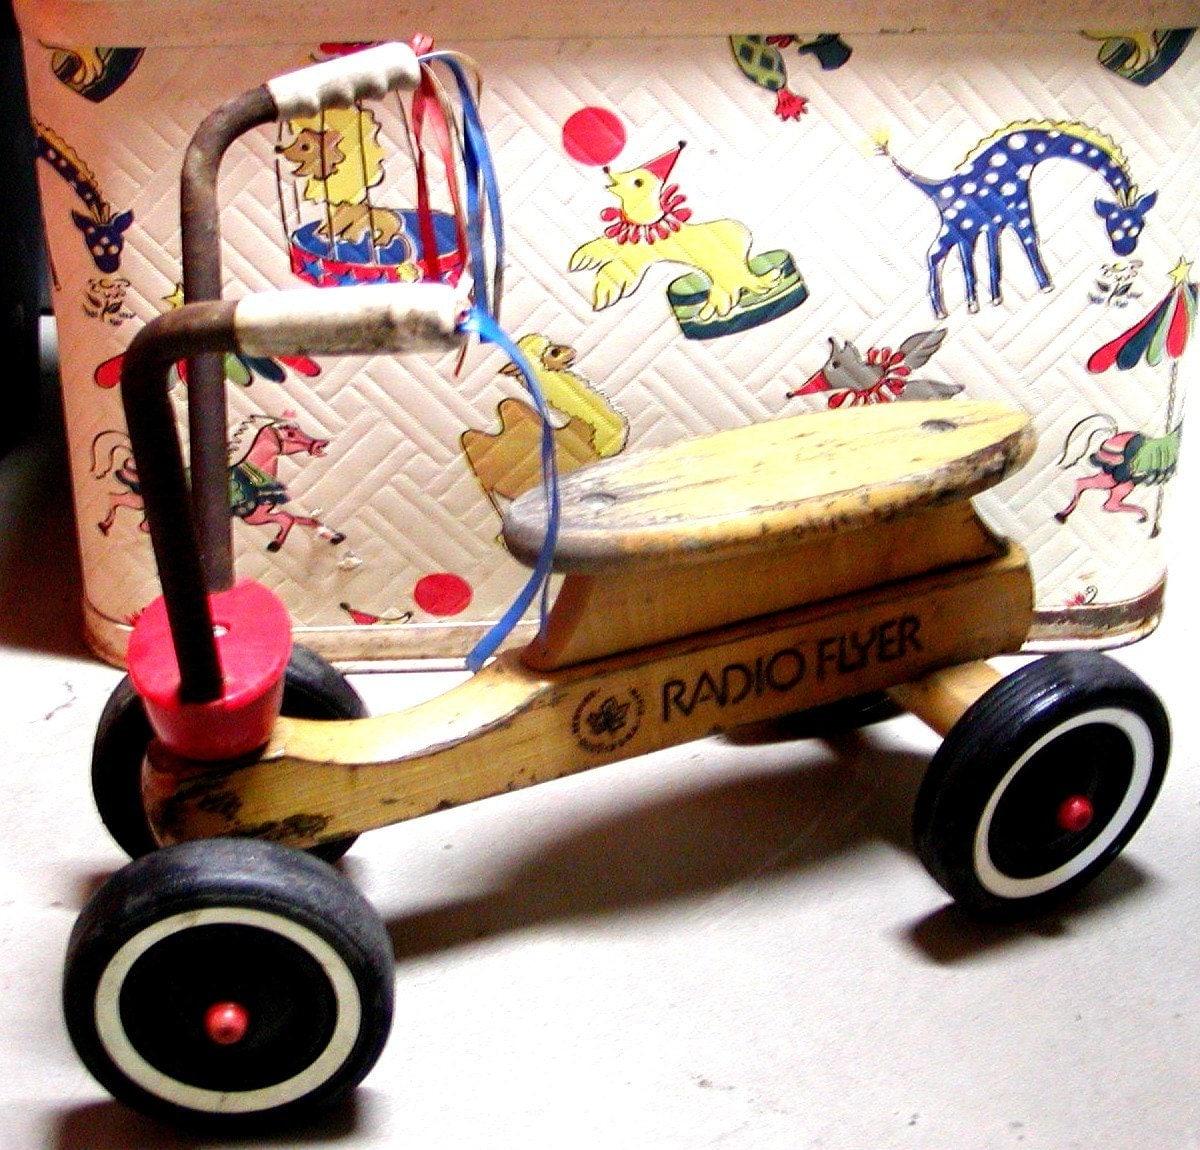 Vintage Radio Flyer Wooden Trike - 345.3KB